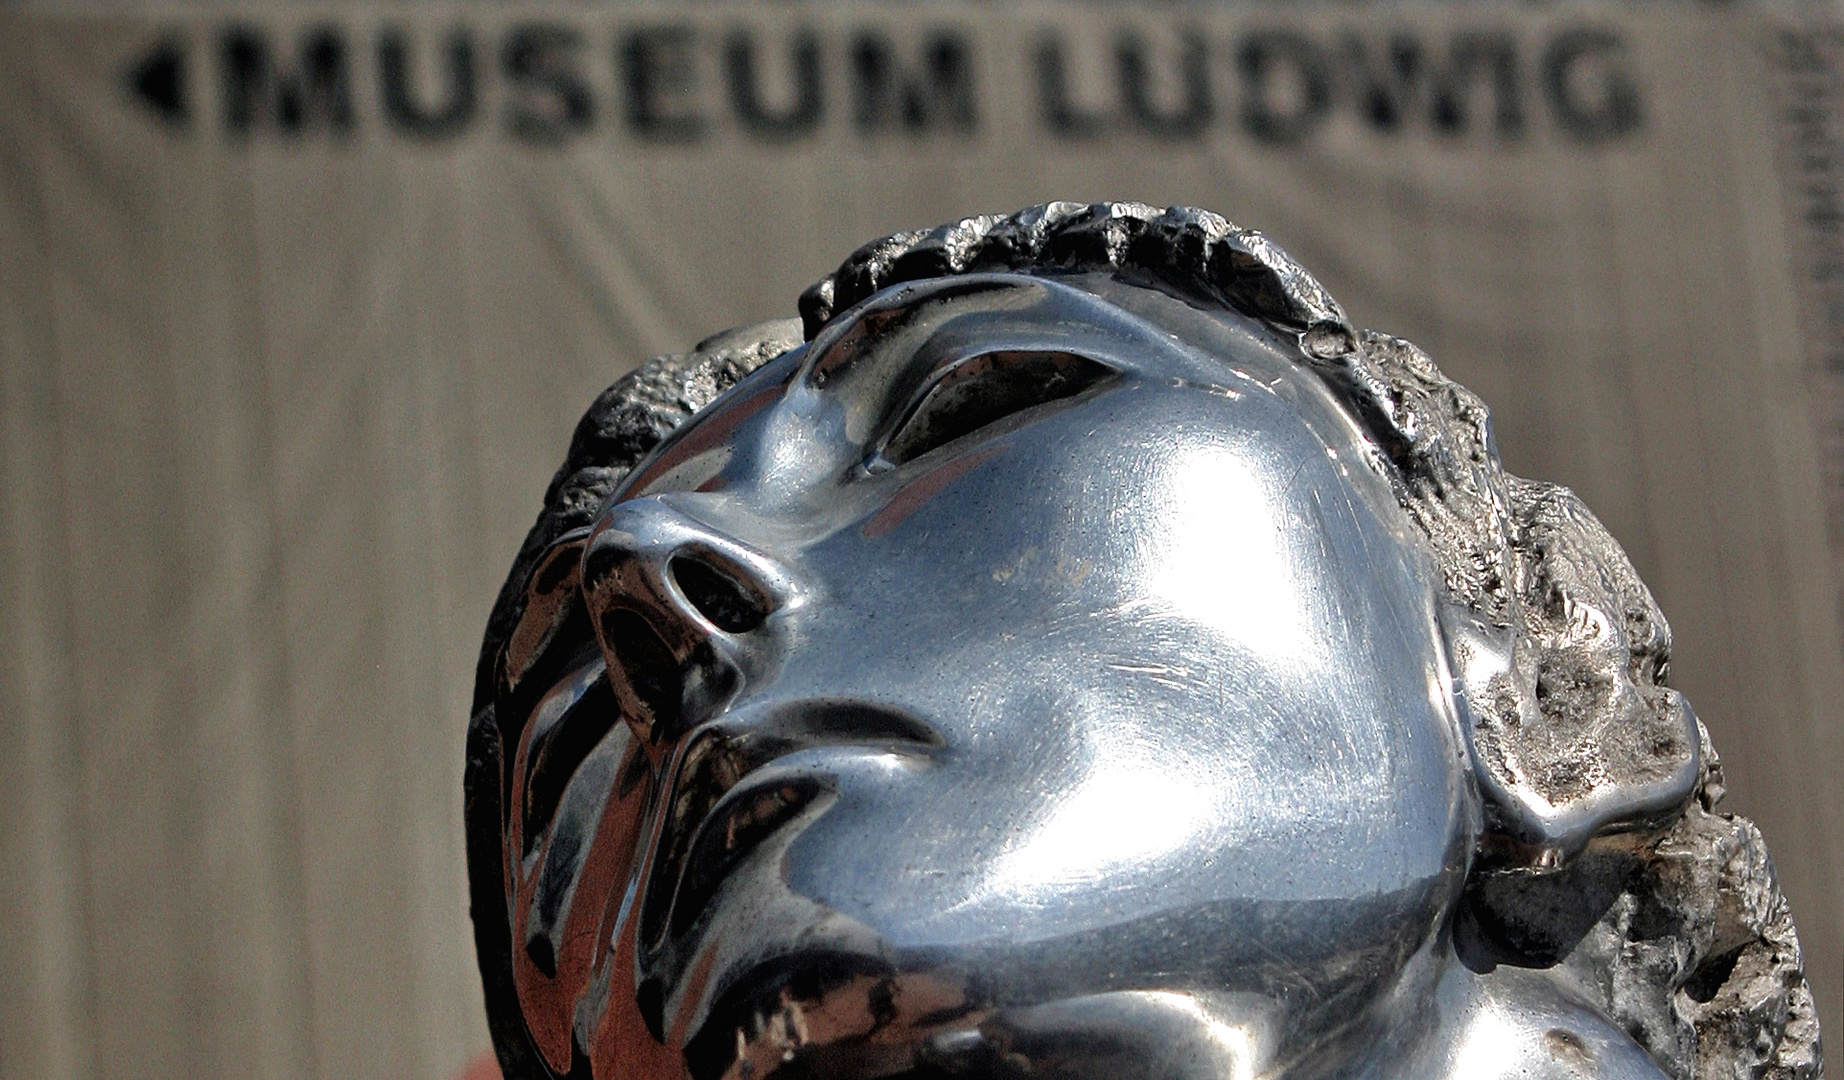 Museum Ludwik Skulptur